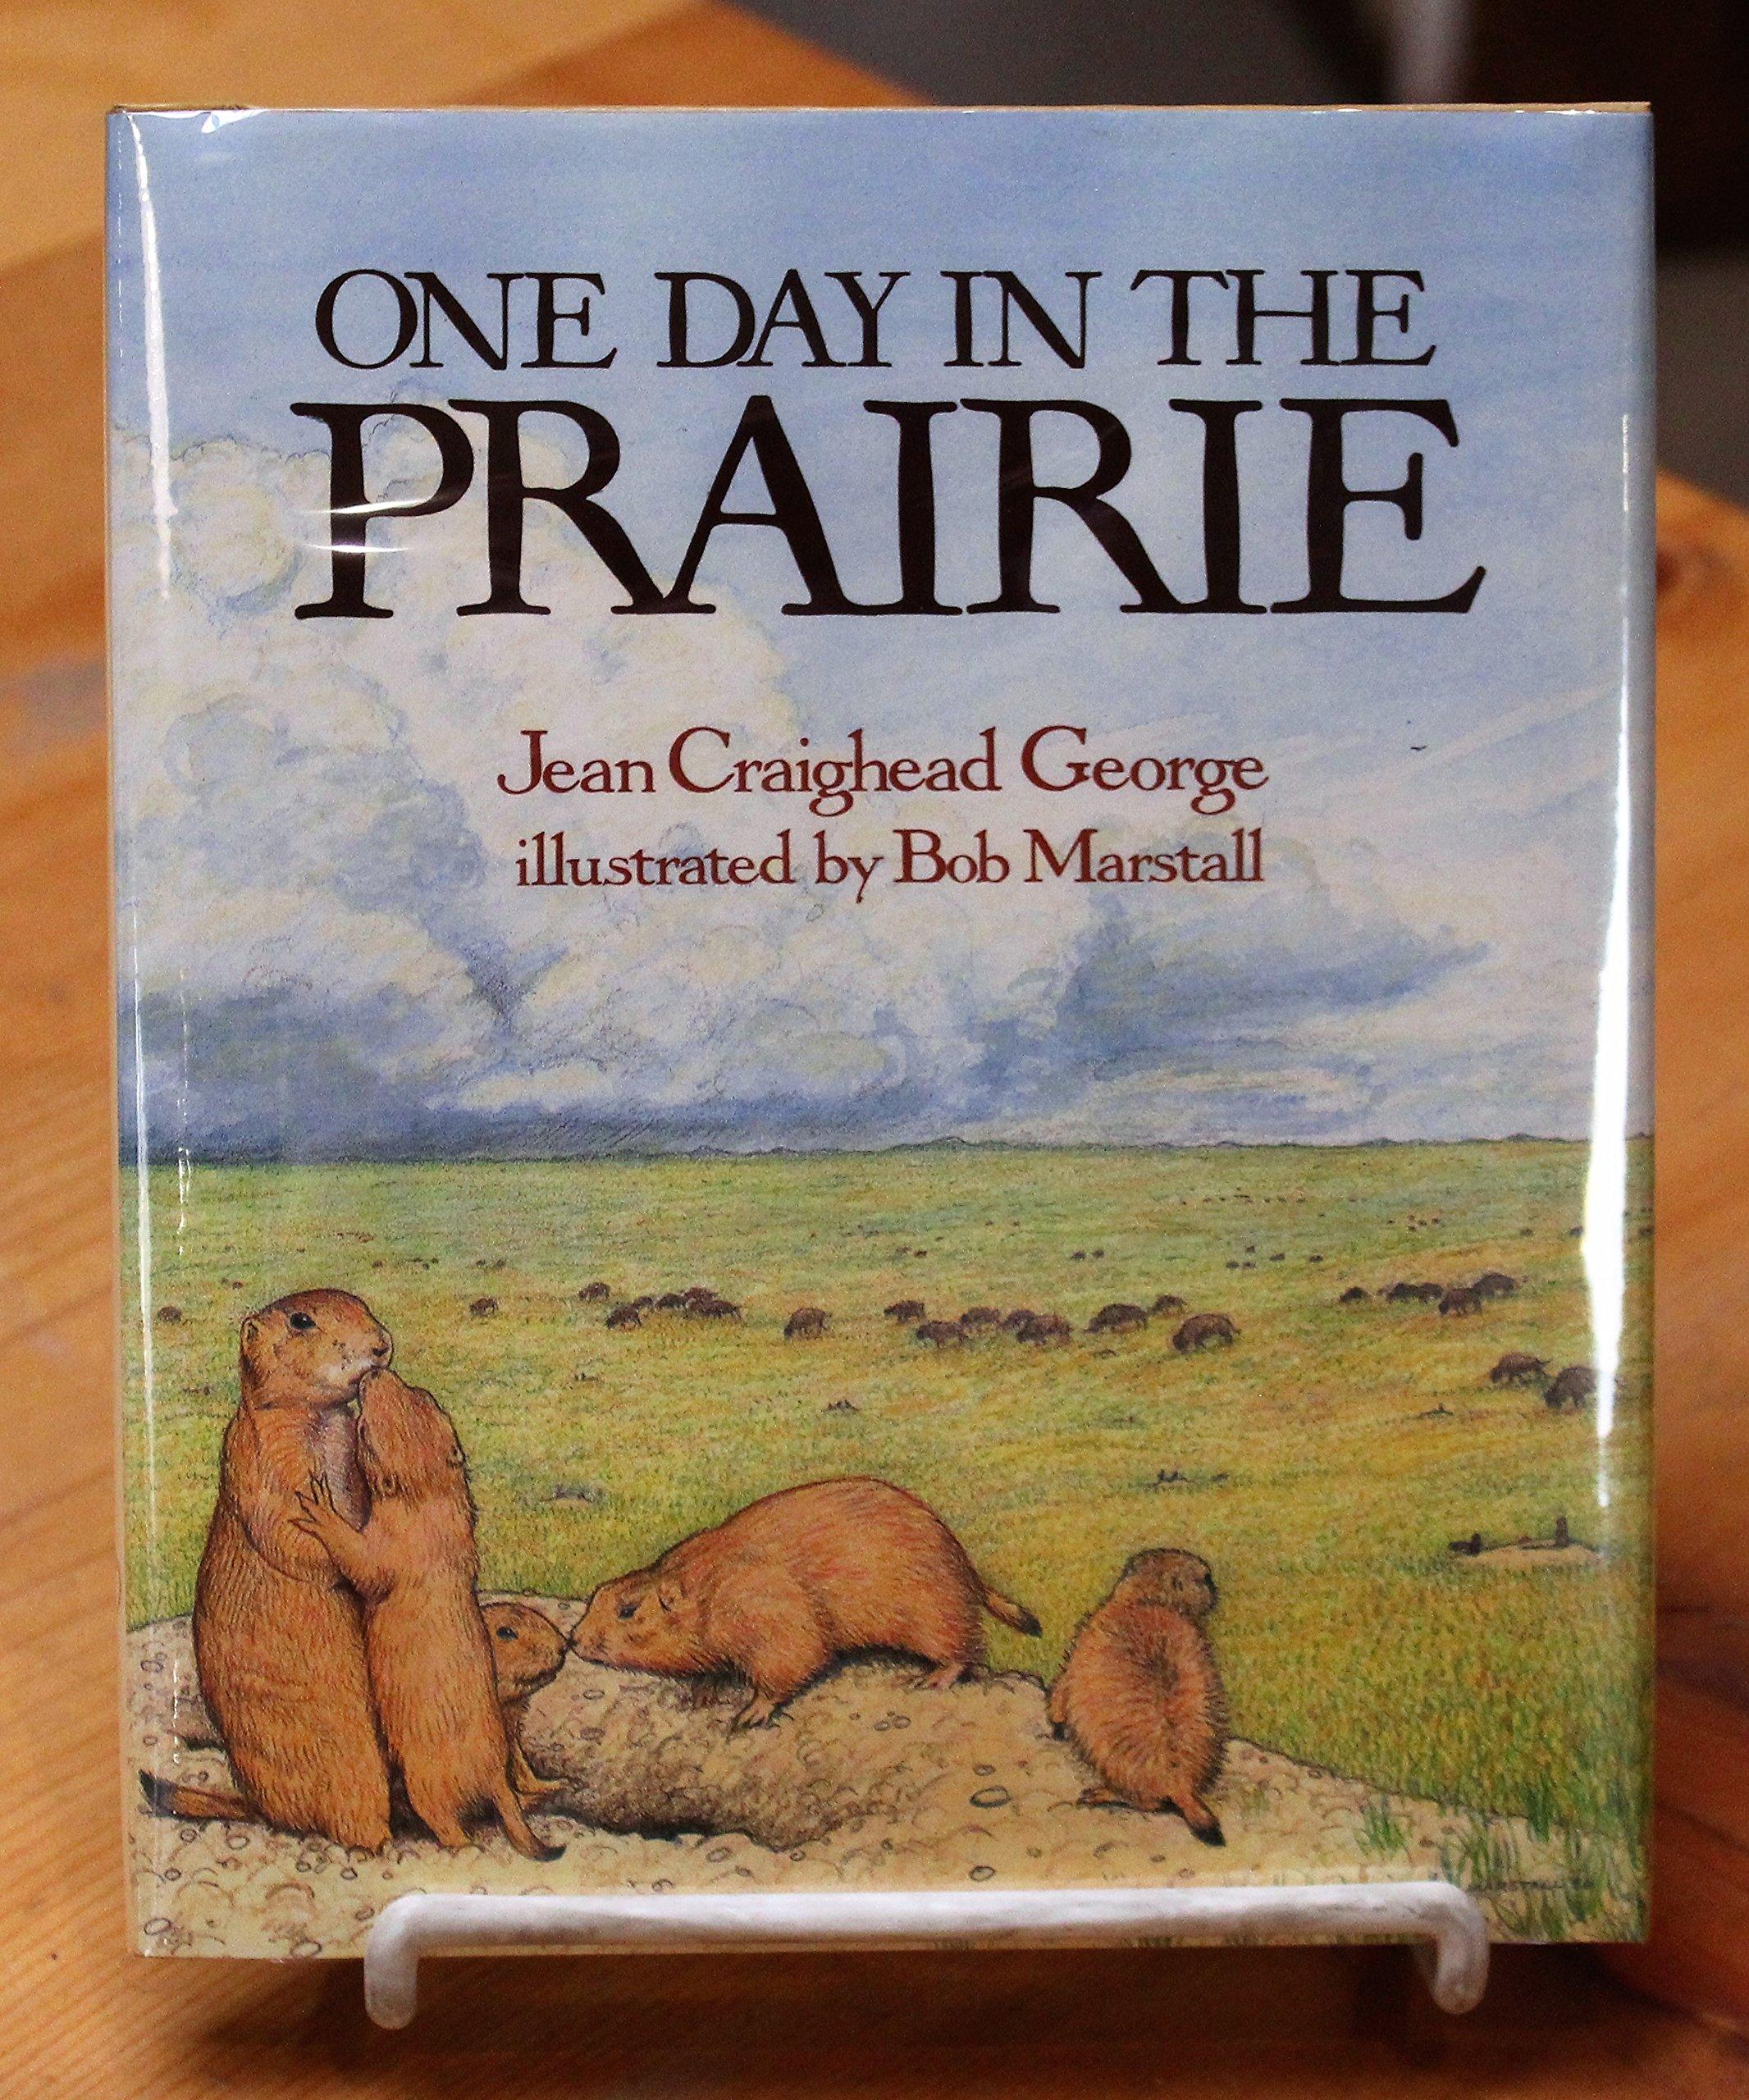 One Day in the Prairie: Amazon.co.uk: Jean Craighead George: 9780690045666:  Books